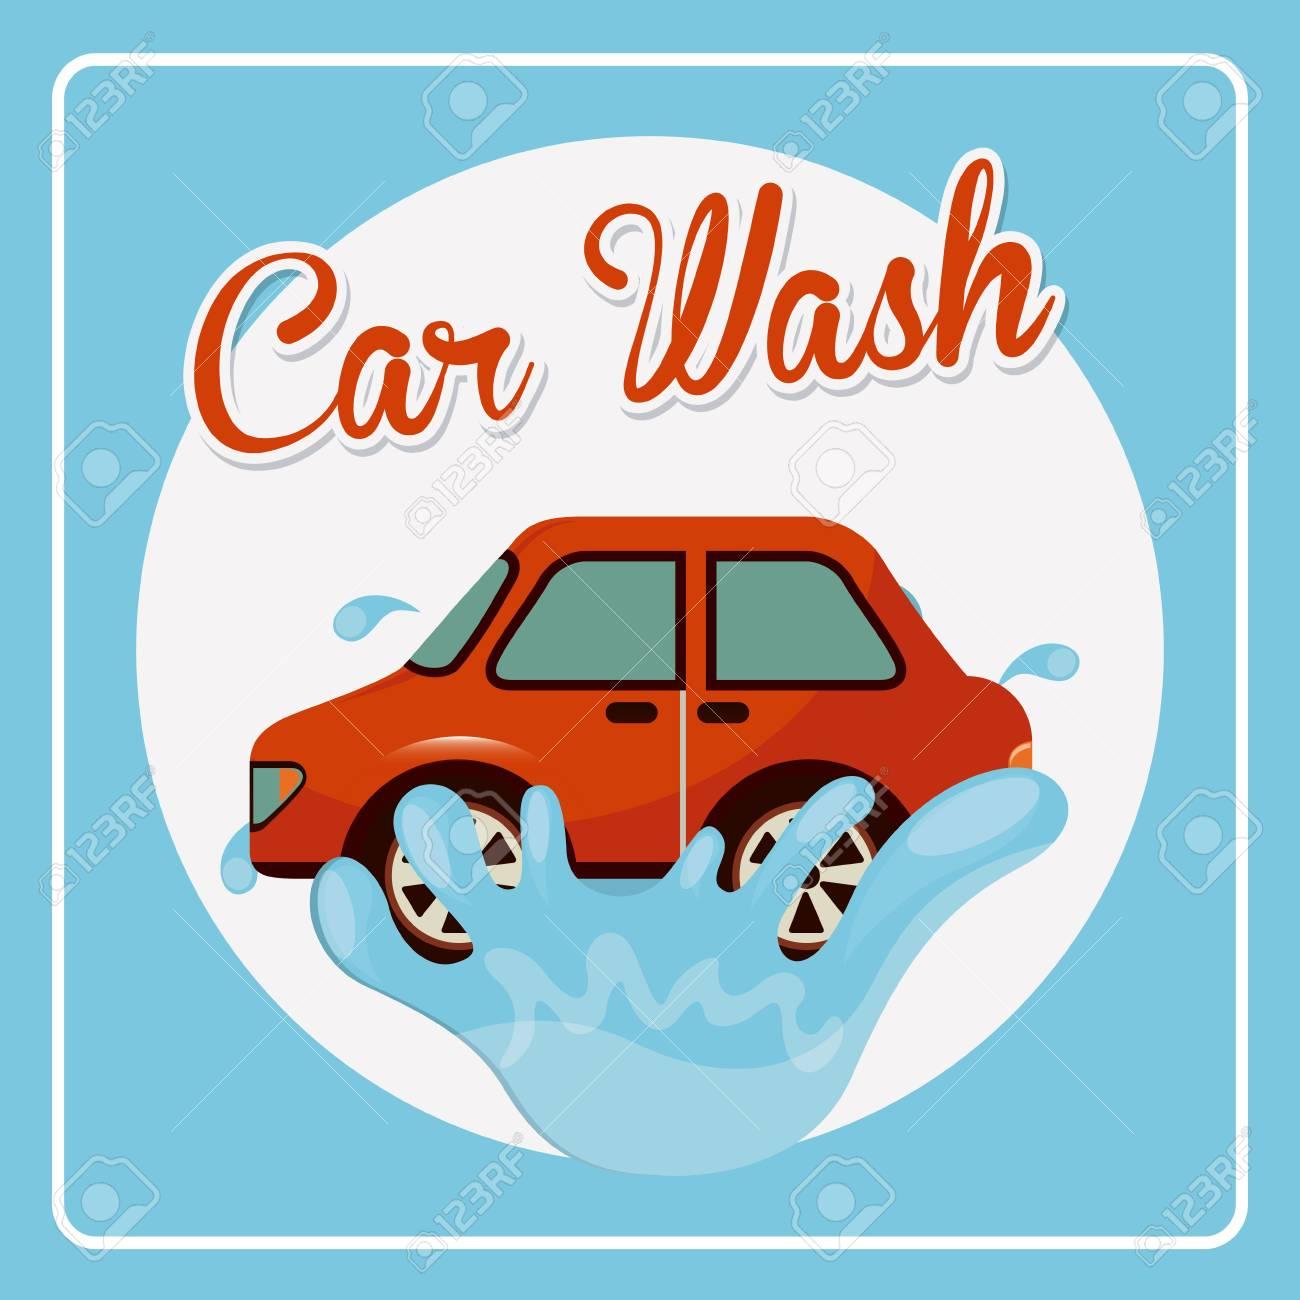 car wash design, vector illustration eps10 graphic.